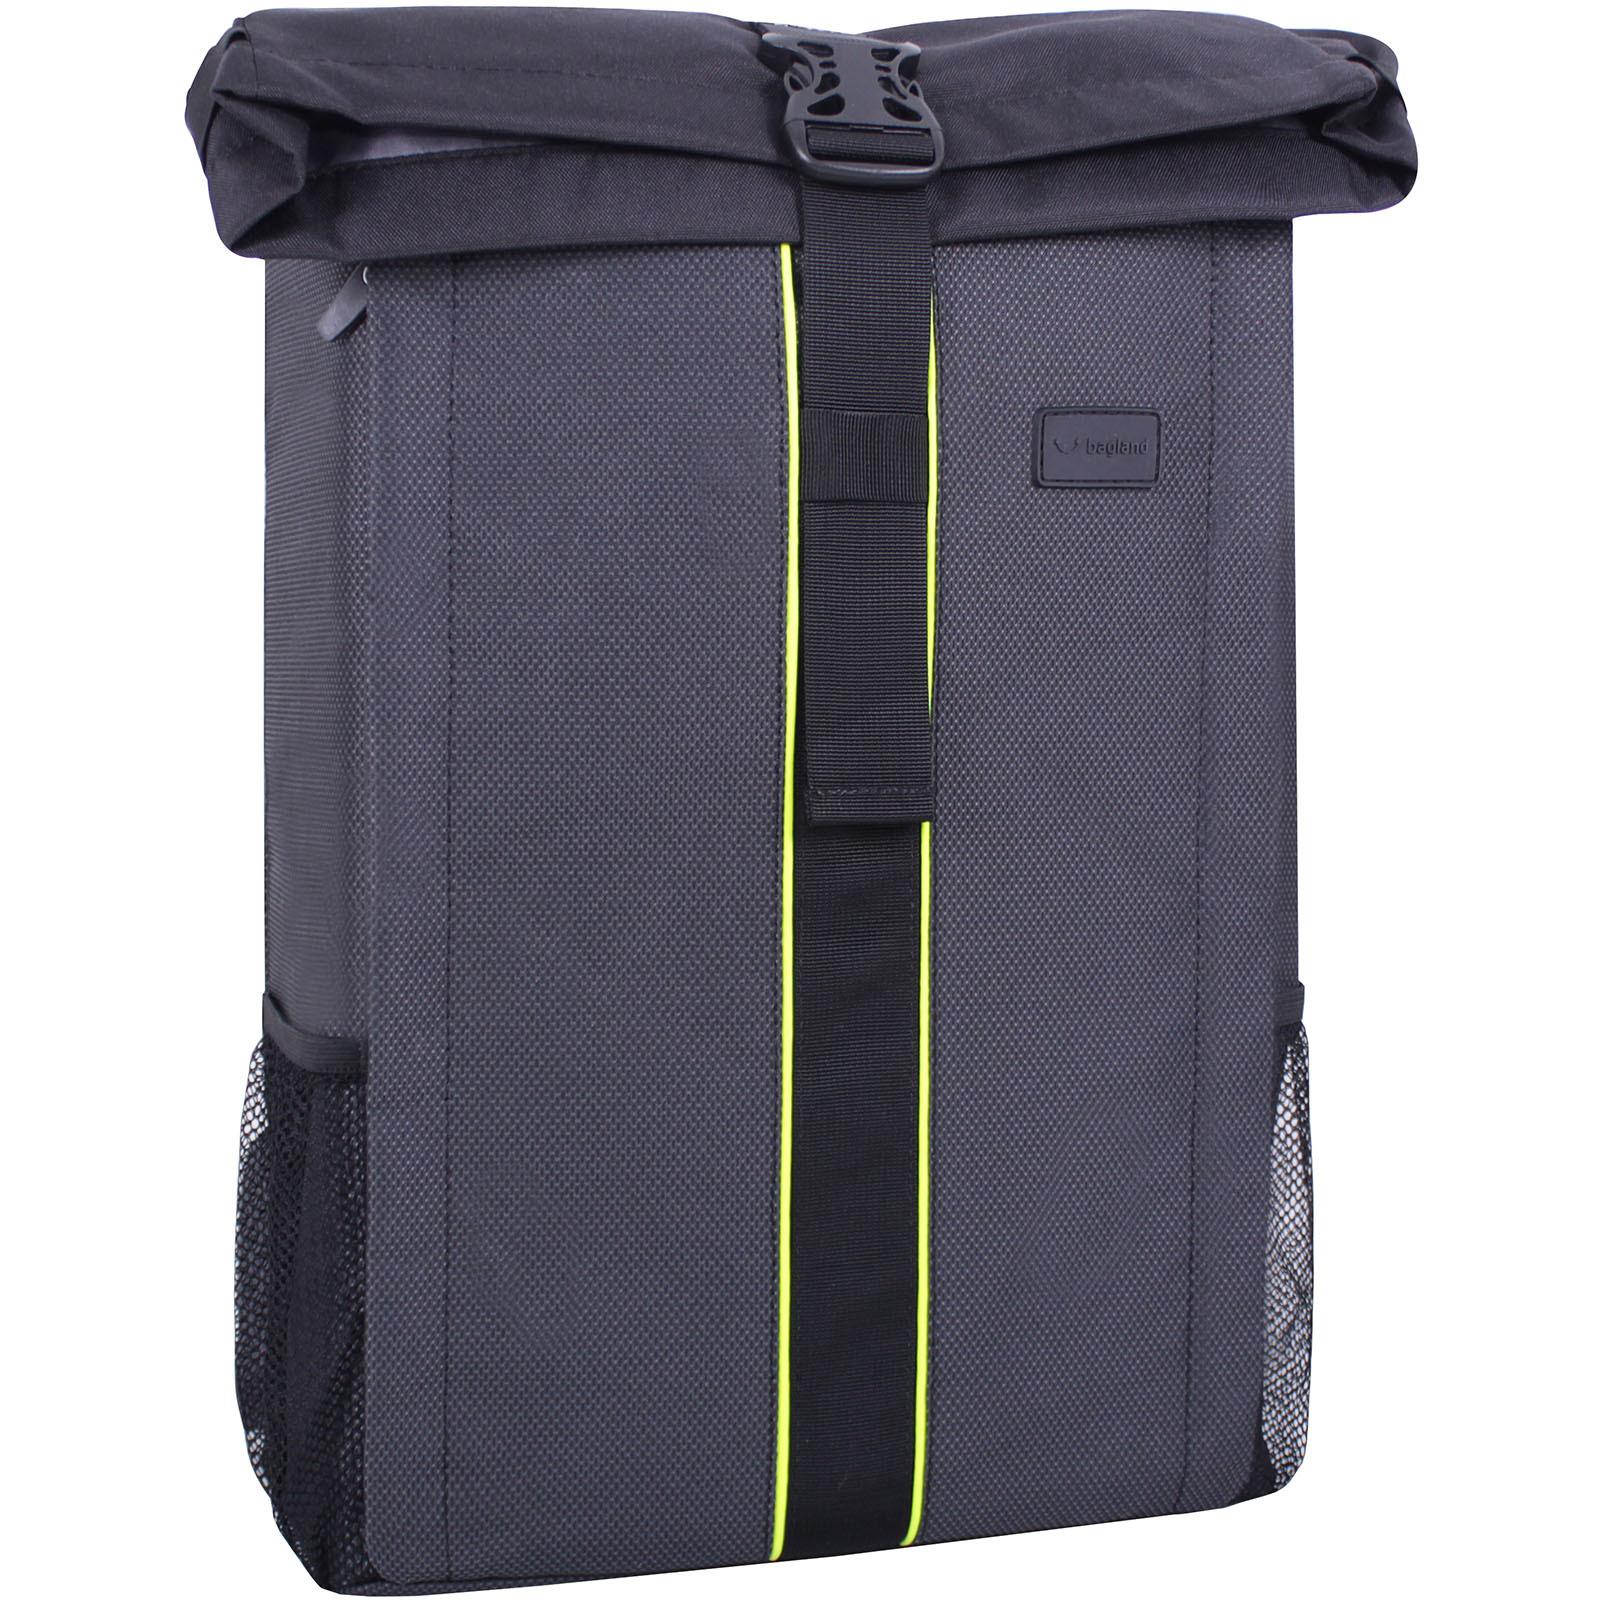 Мужские рюкзаки Рюкзак для ноутбука Bagland Roll 21 л. Чёрный (00156169) IMG_3471.jpg